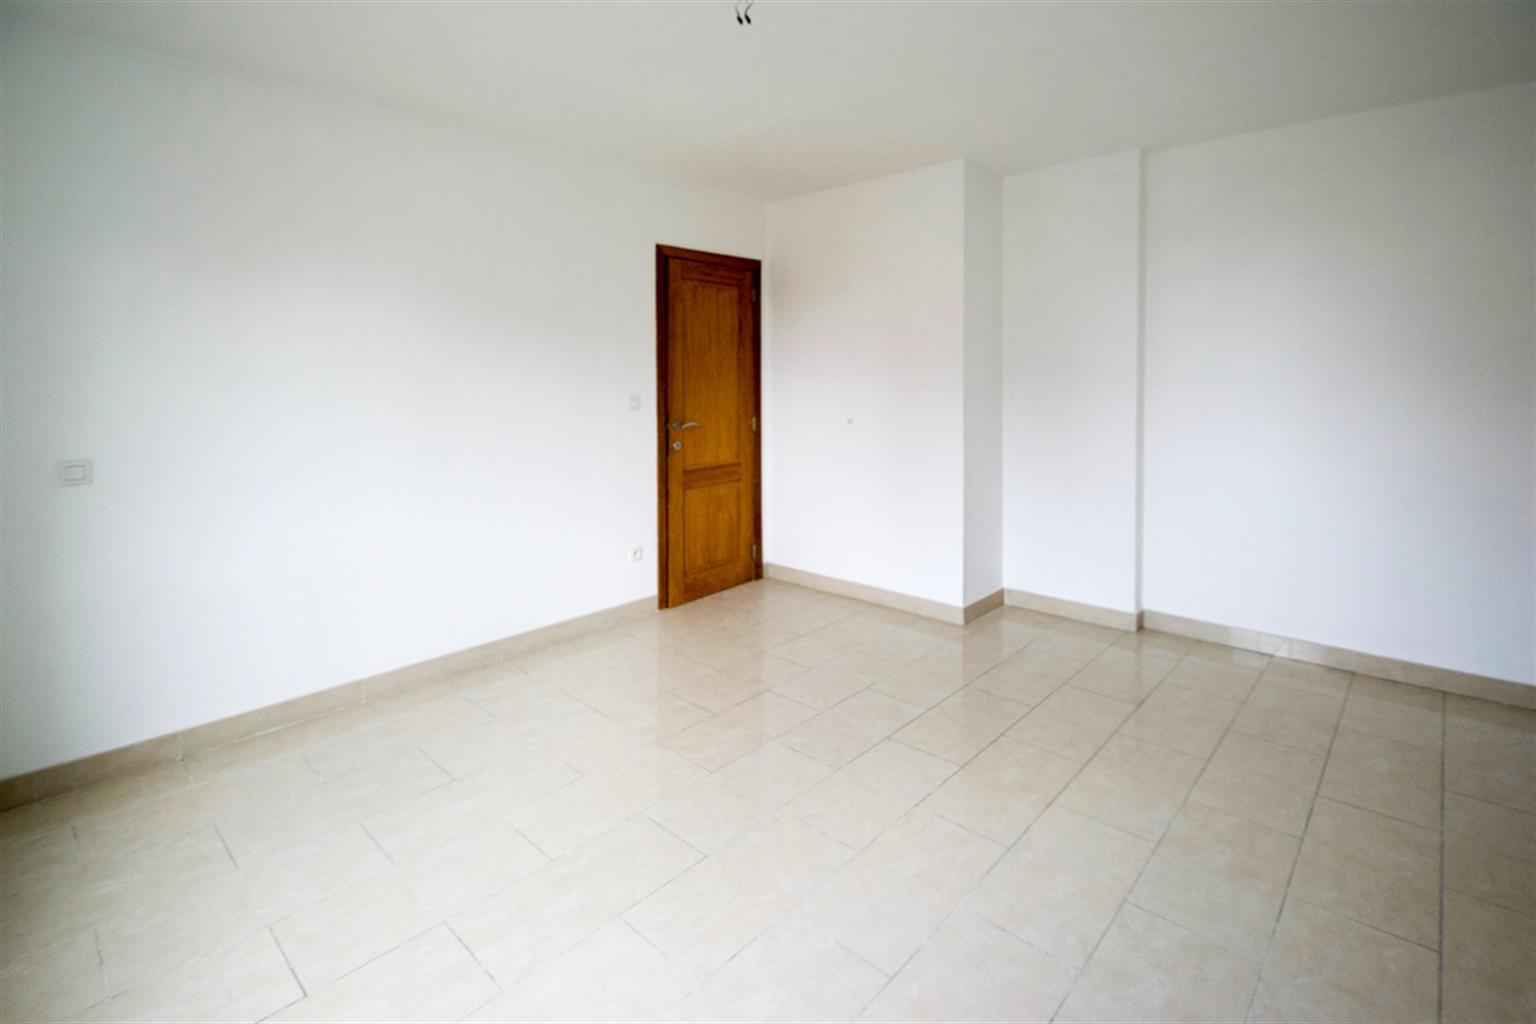 Appartement - Binche Leval-Trahegnies - #3734770-4